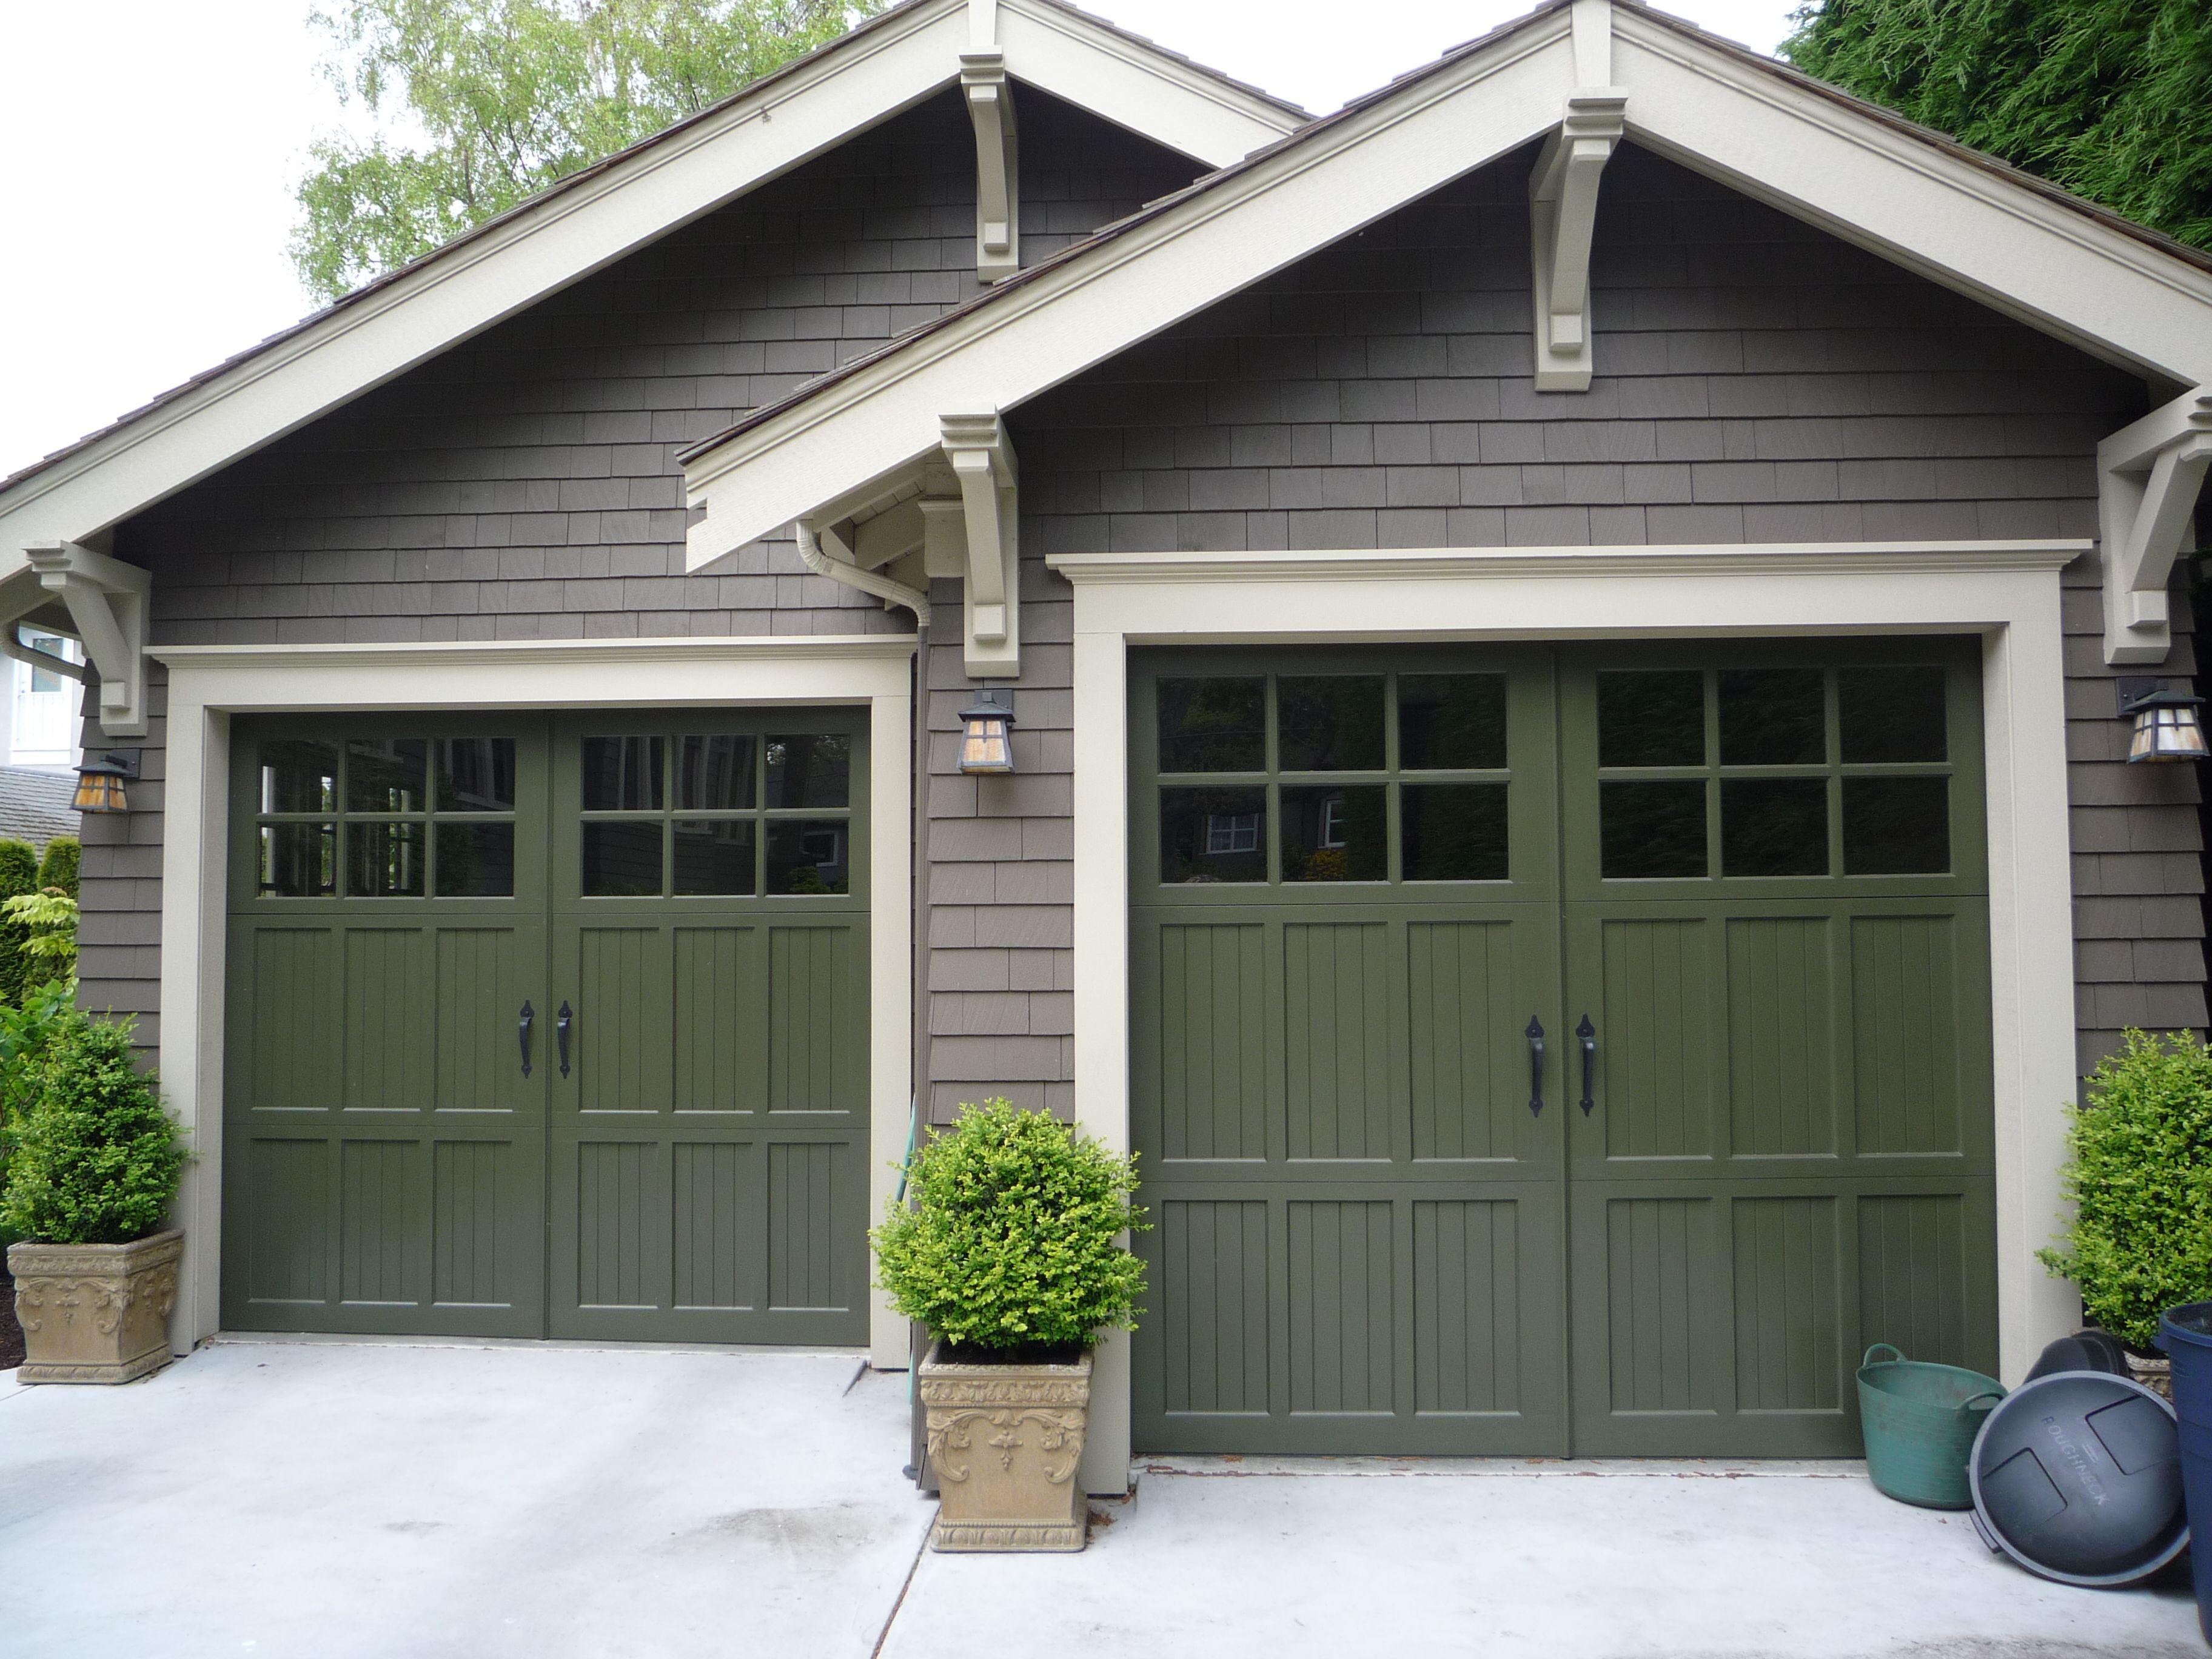 garage decal image without windows styles door kit doors style faux vinyl craftsman x